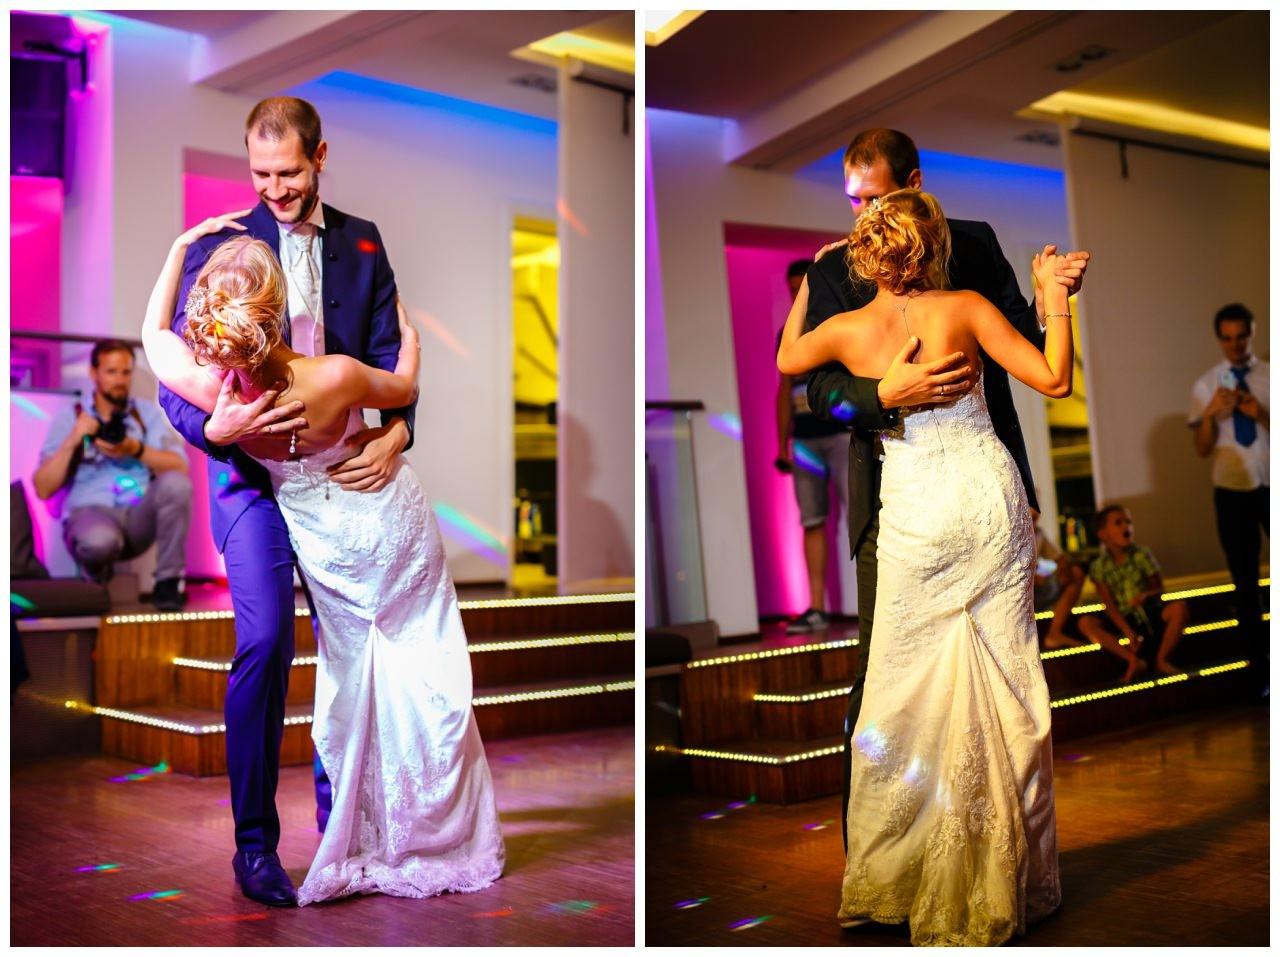 Hochzeit am See Seepavillion Fühlinger Köln Hochzeitsfotograf Hochzeitsfotos 68 - Hochzeit am Seepavillon Fühlinger See in Köln